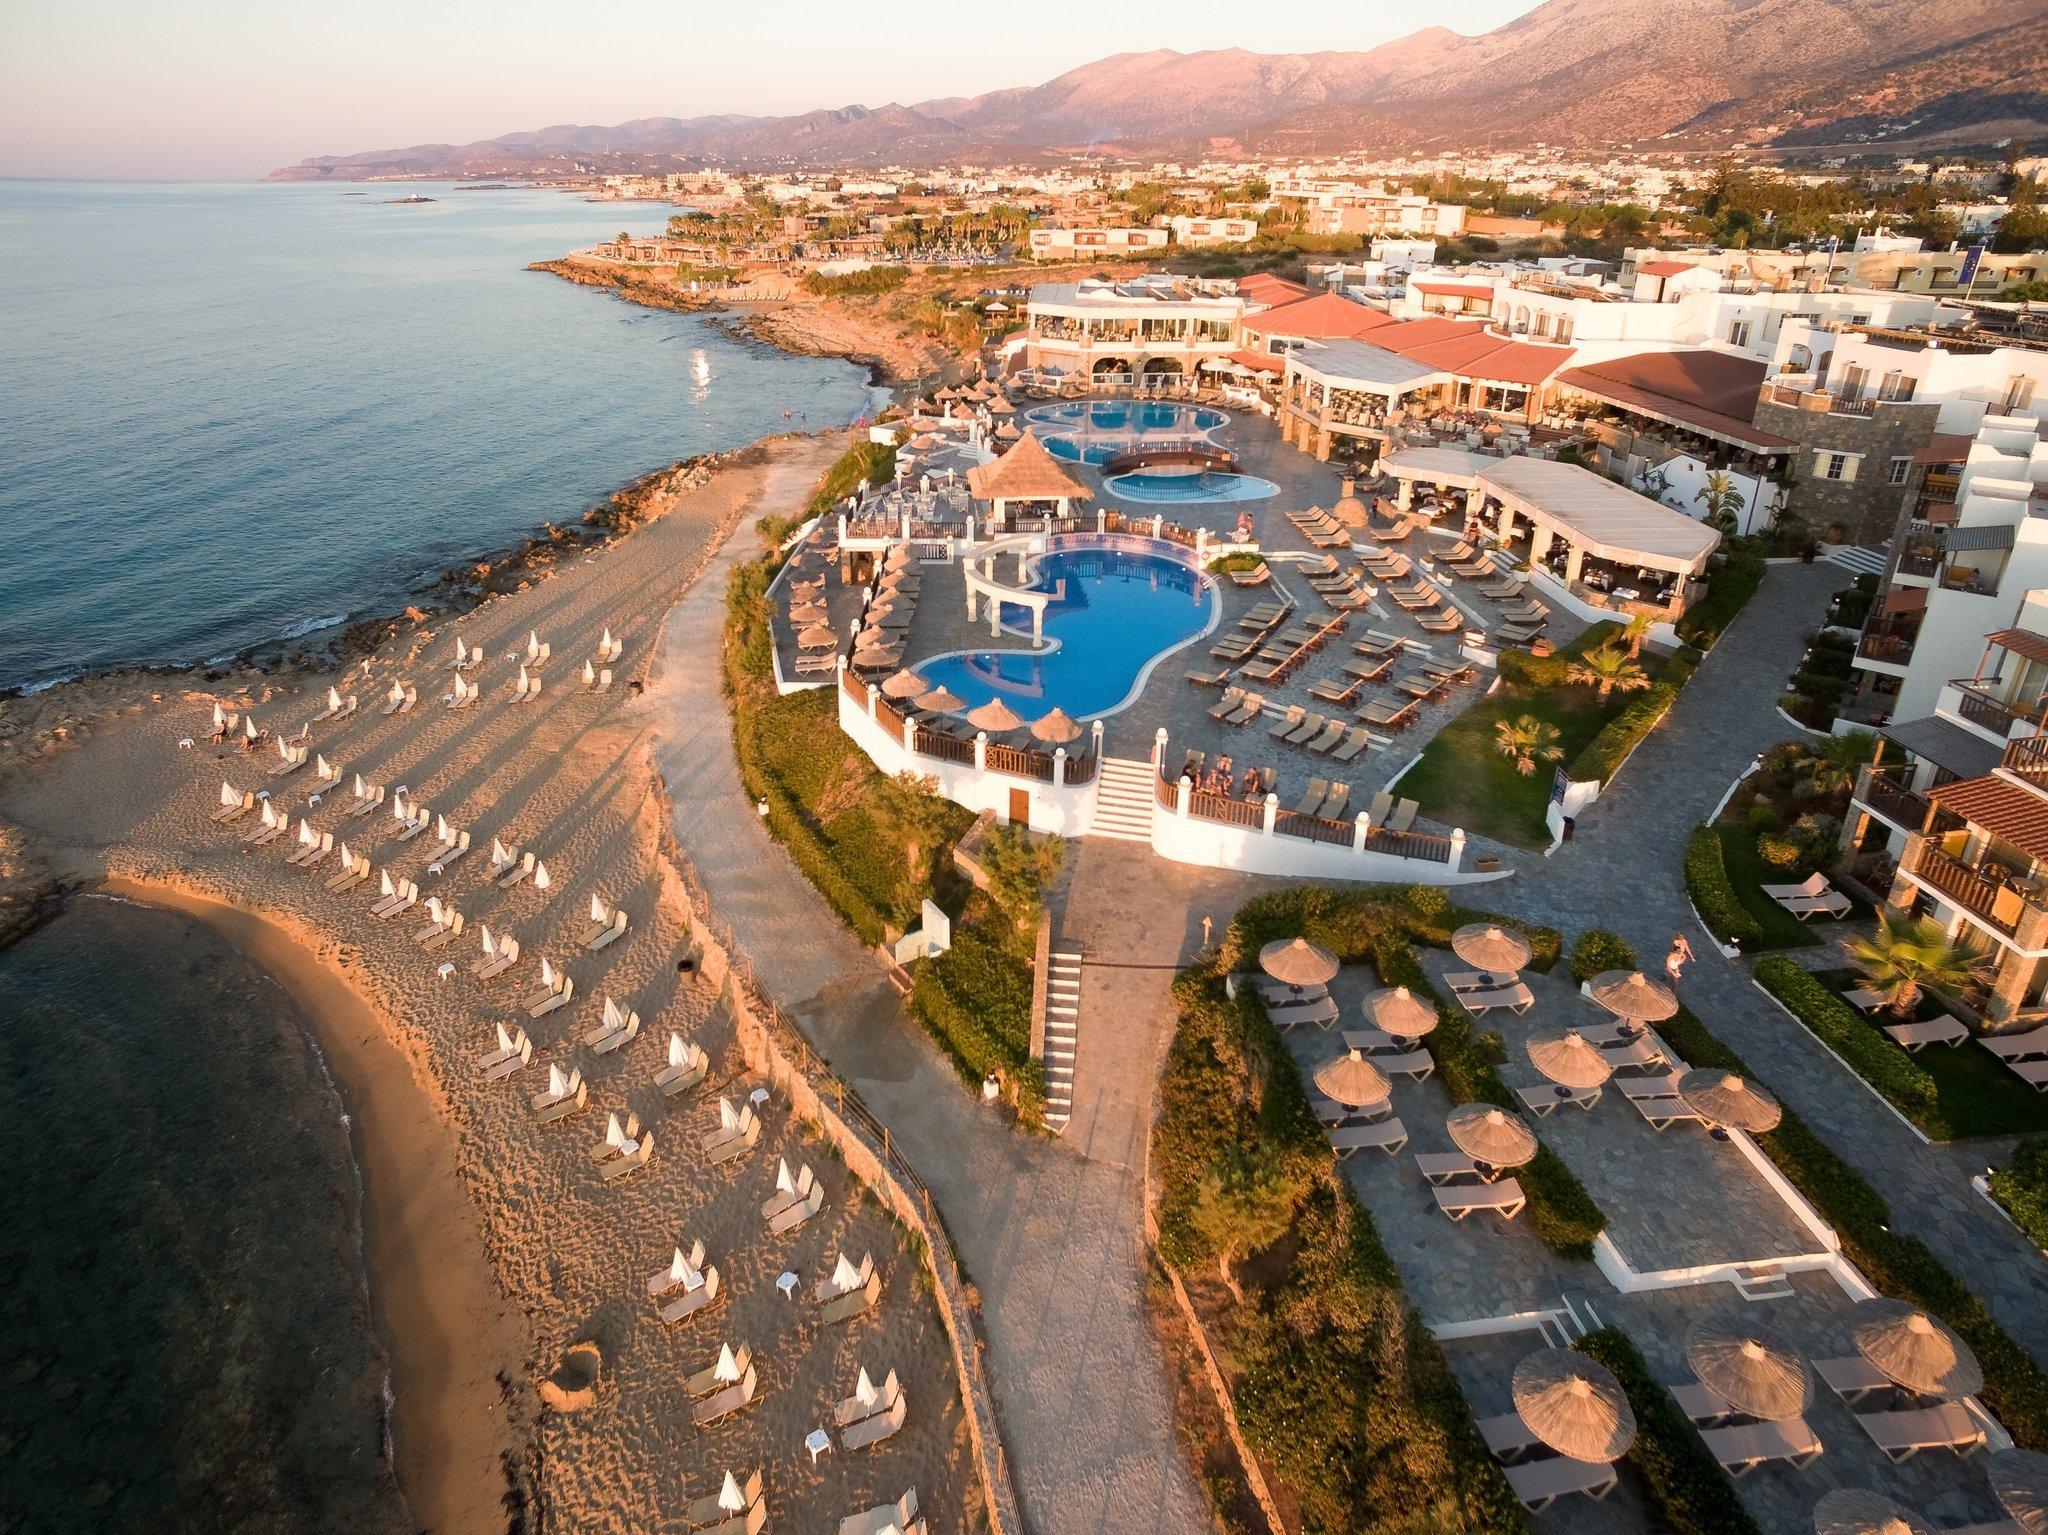 TOP 鄉際線亞歷山大海灘村莊克里特飯店